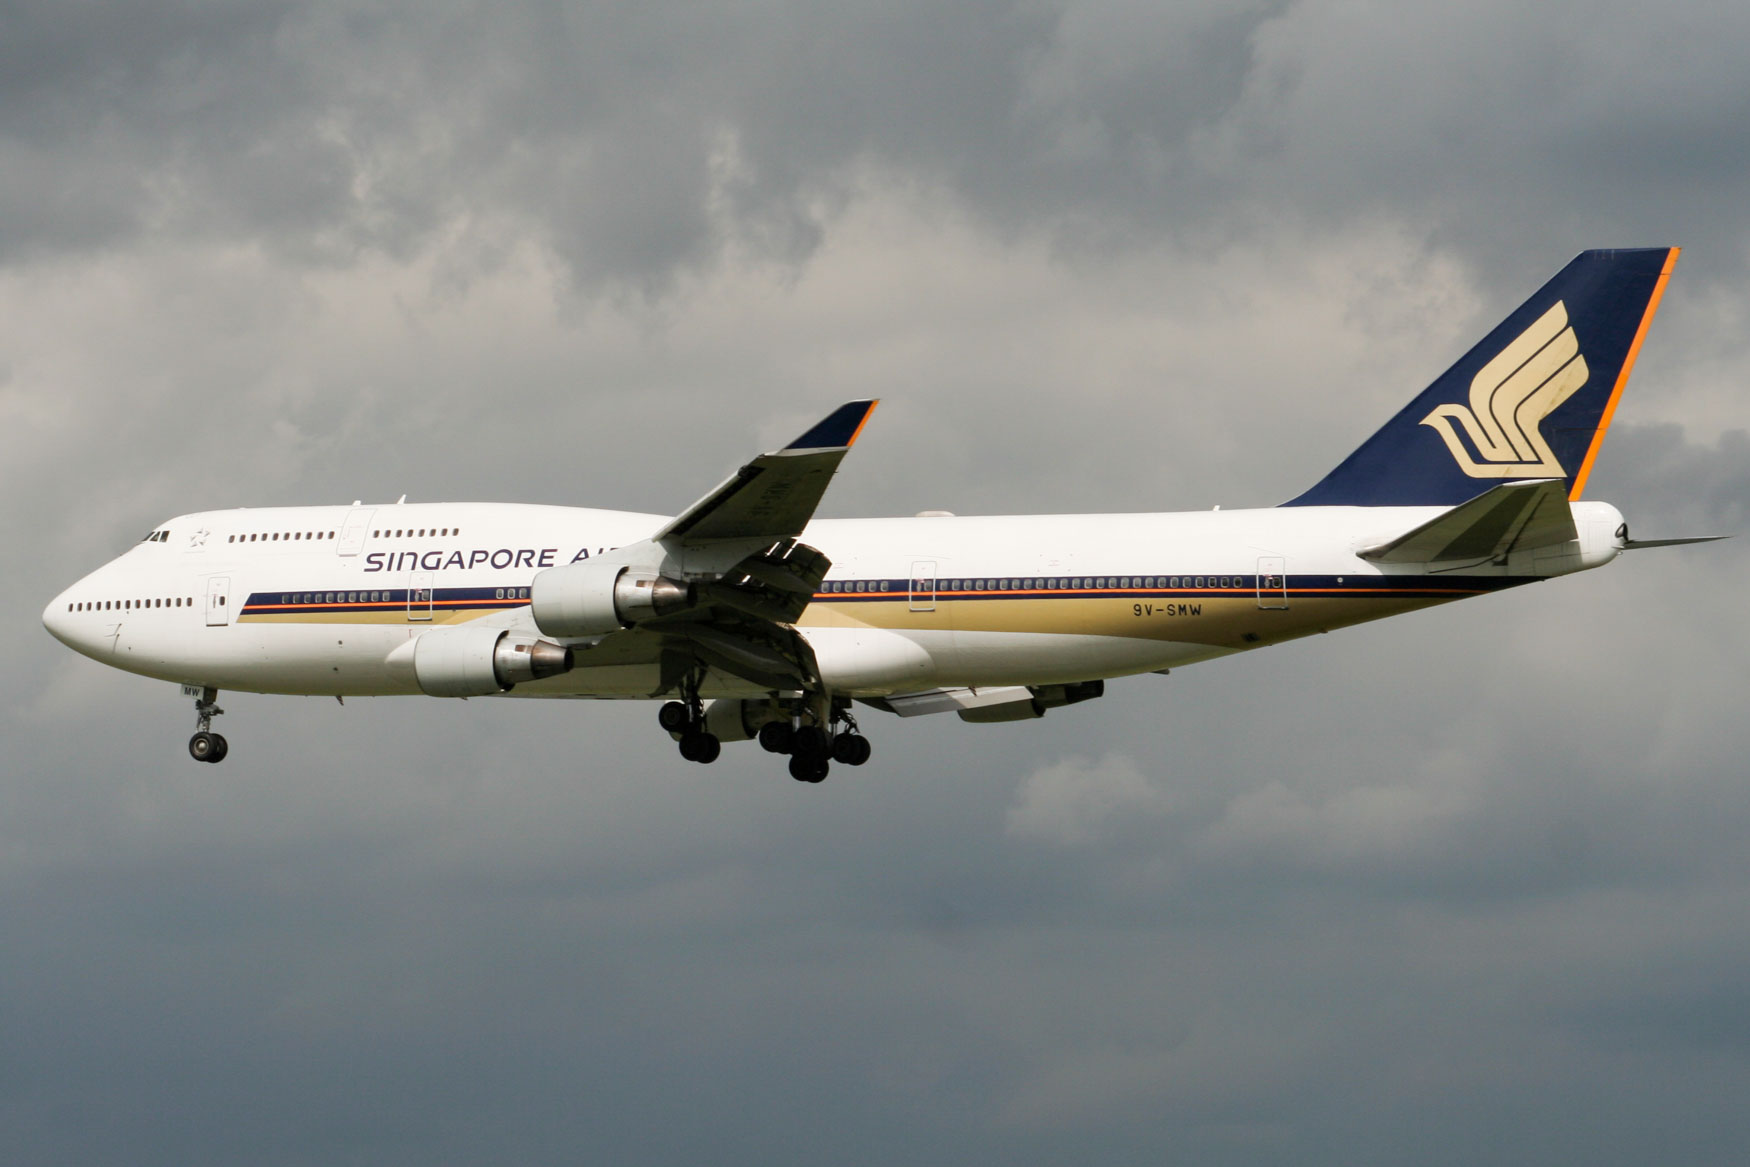 Singapore Airlines 747-400 at Frankfurt